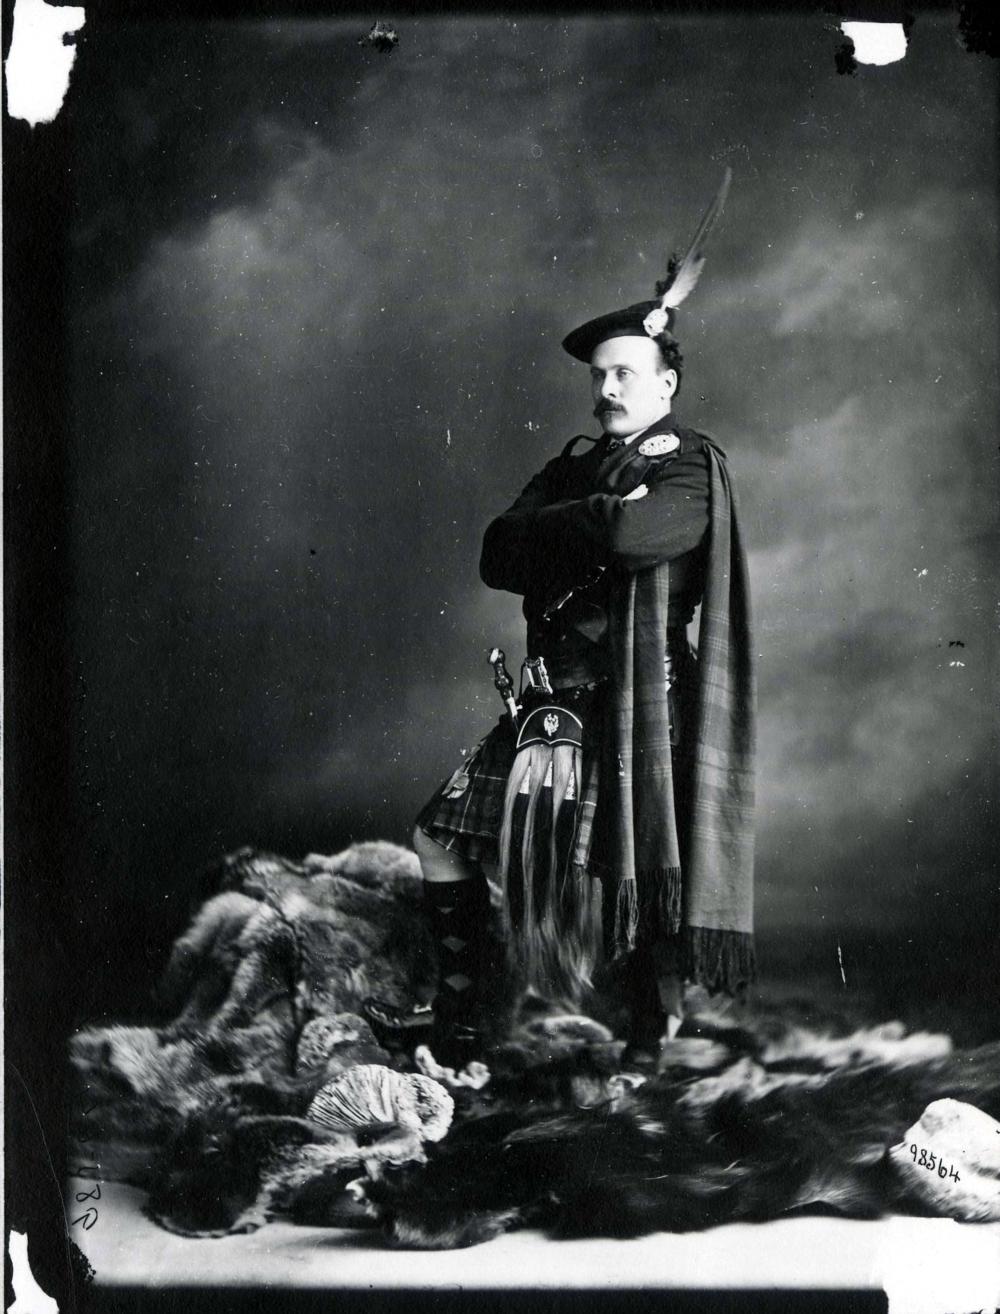 Dat Highland swagger circa 1890, HFX